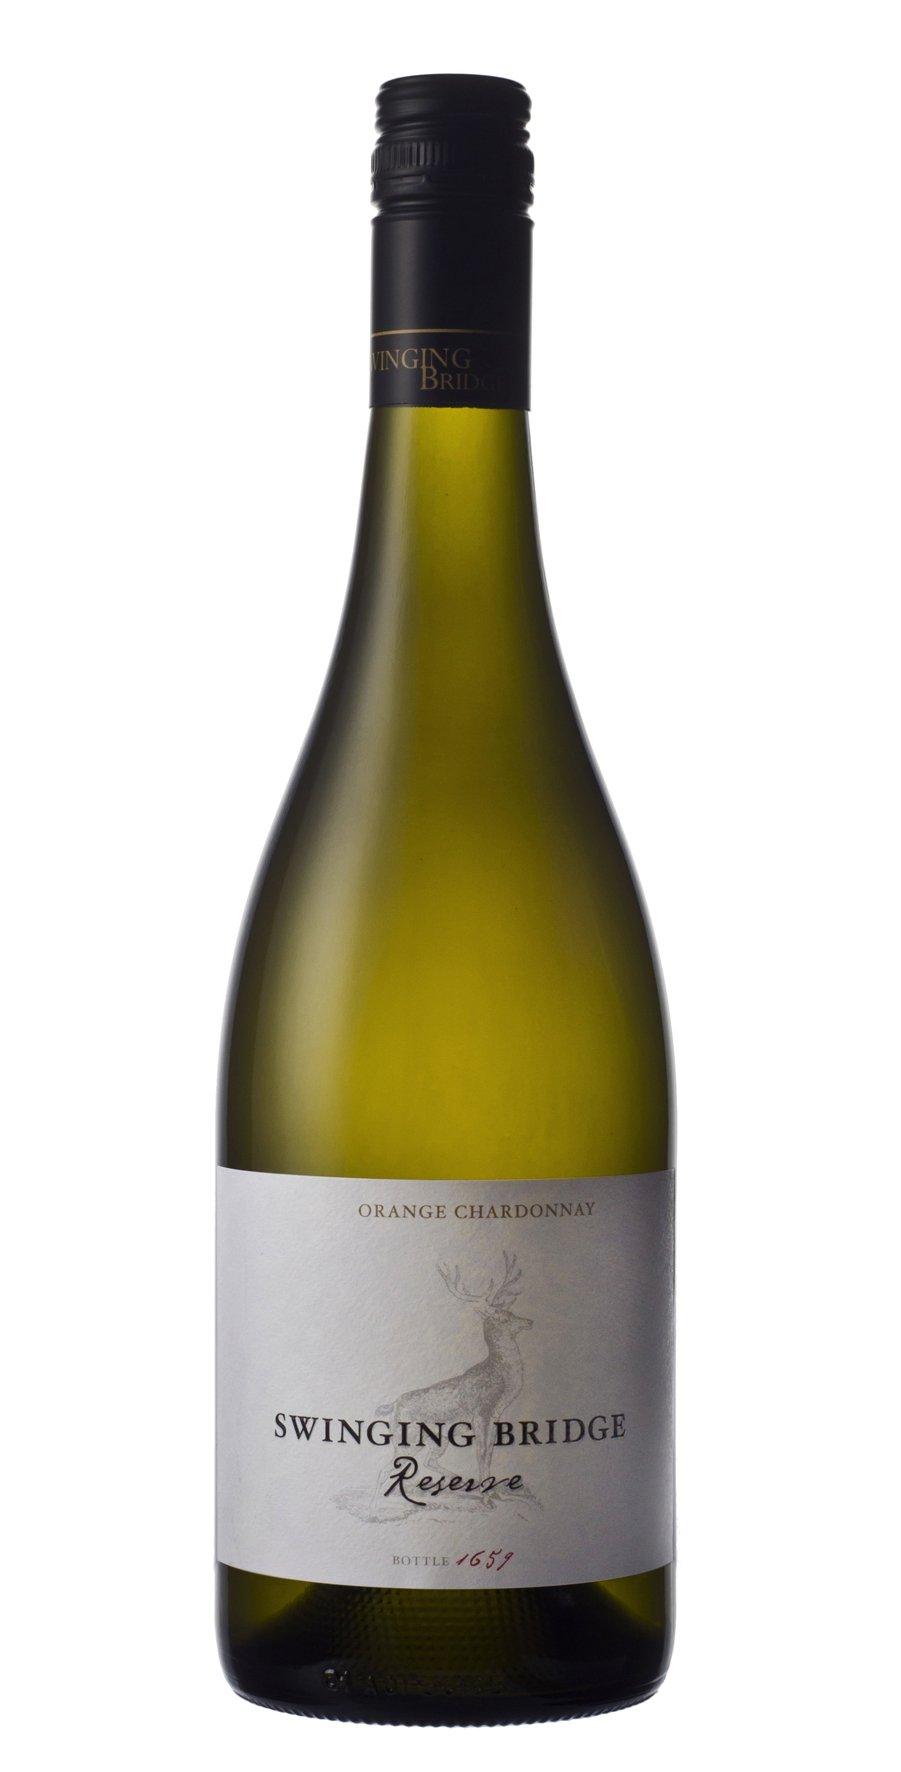 Swinging Bridge 2015 'D' Reserve Chardonnay